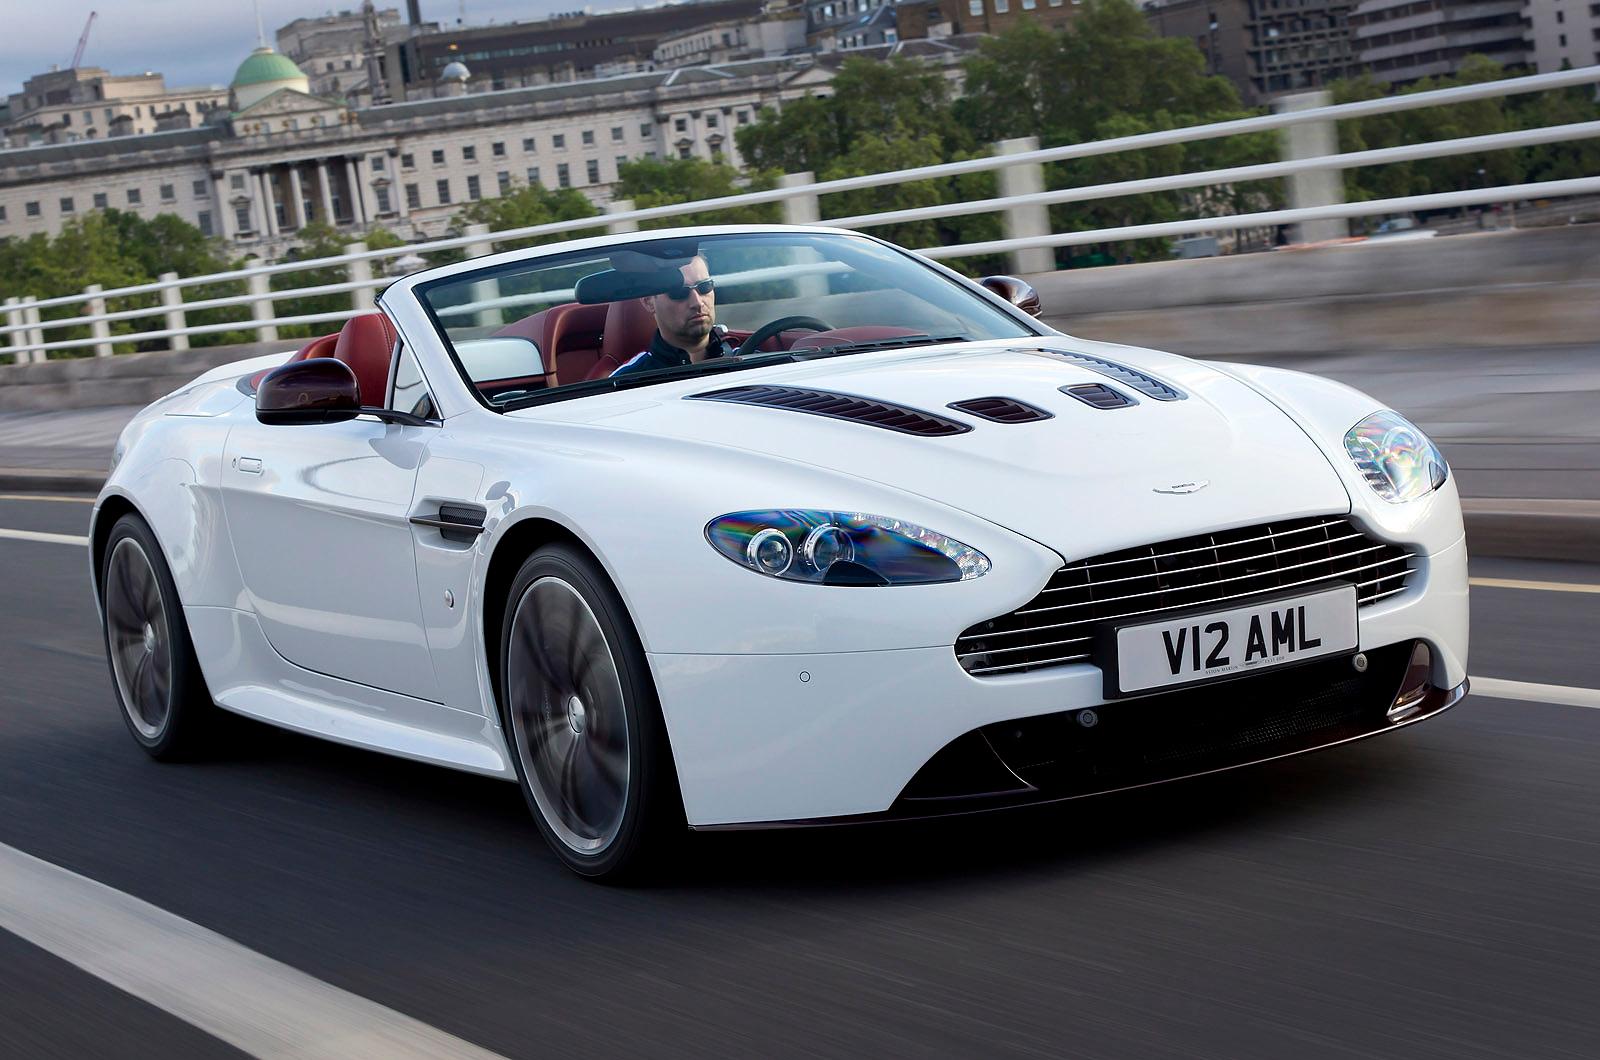 Potent Aston Martin V12 Vantage Roadster Unveiled Autocar